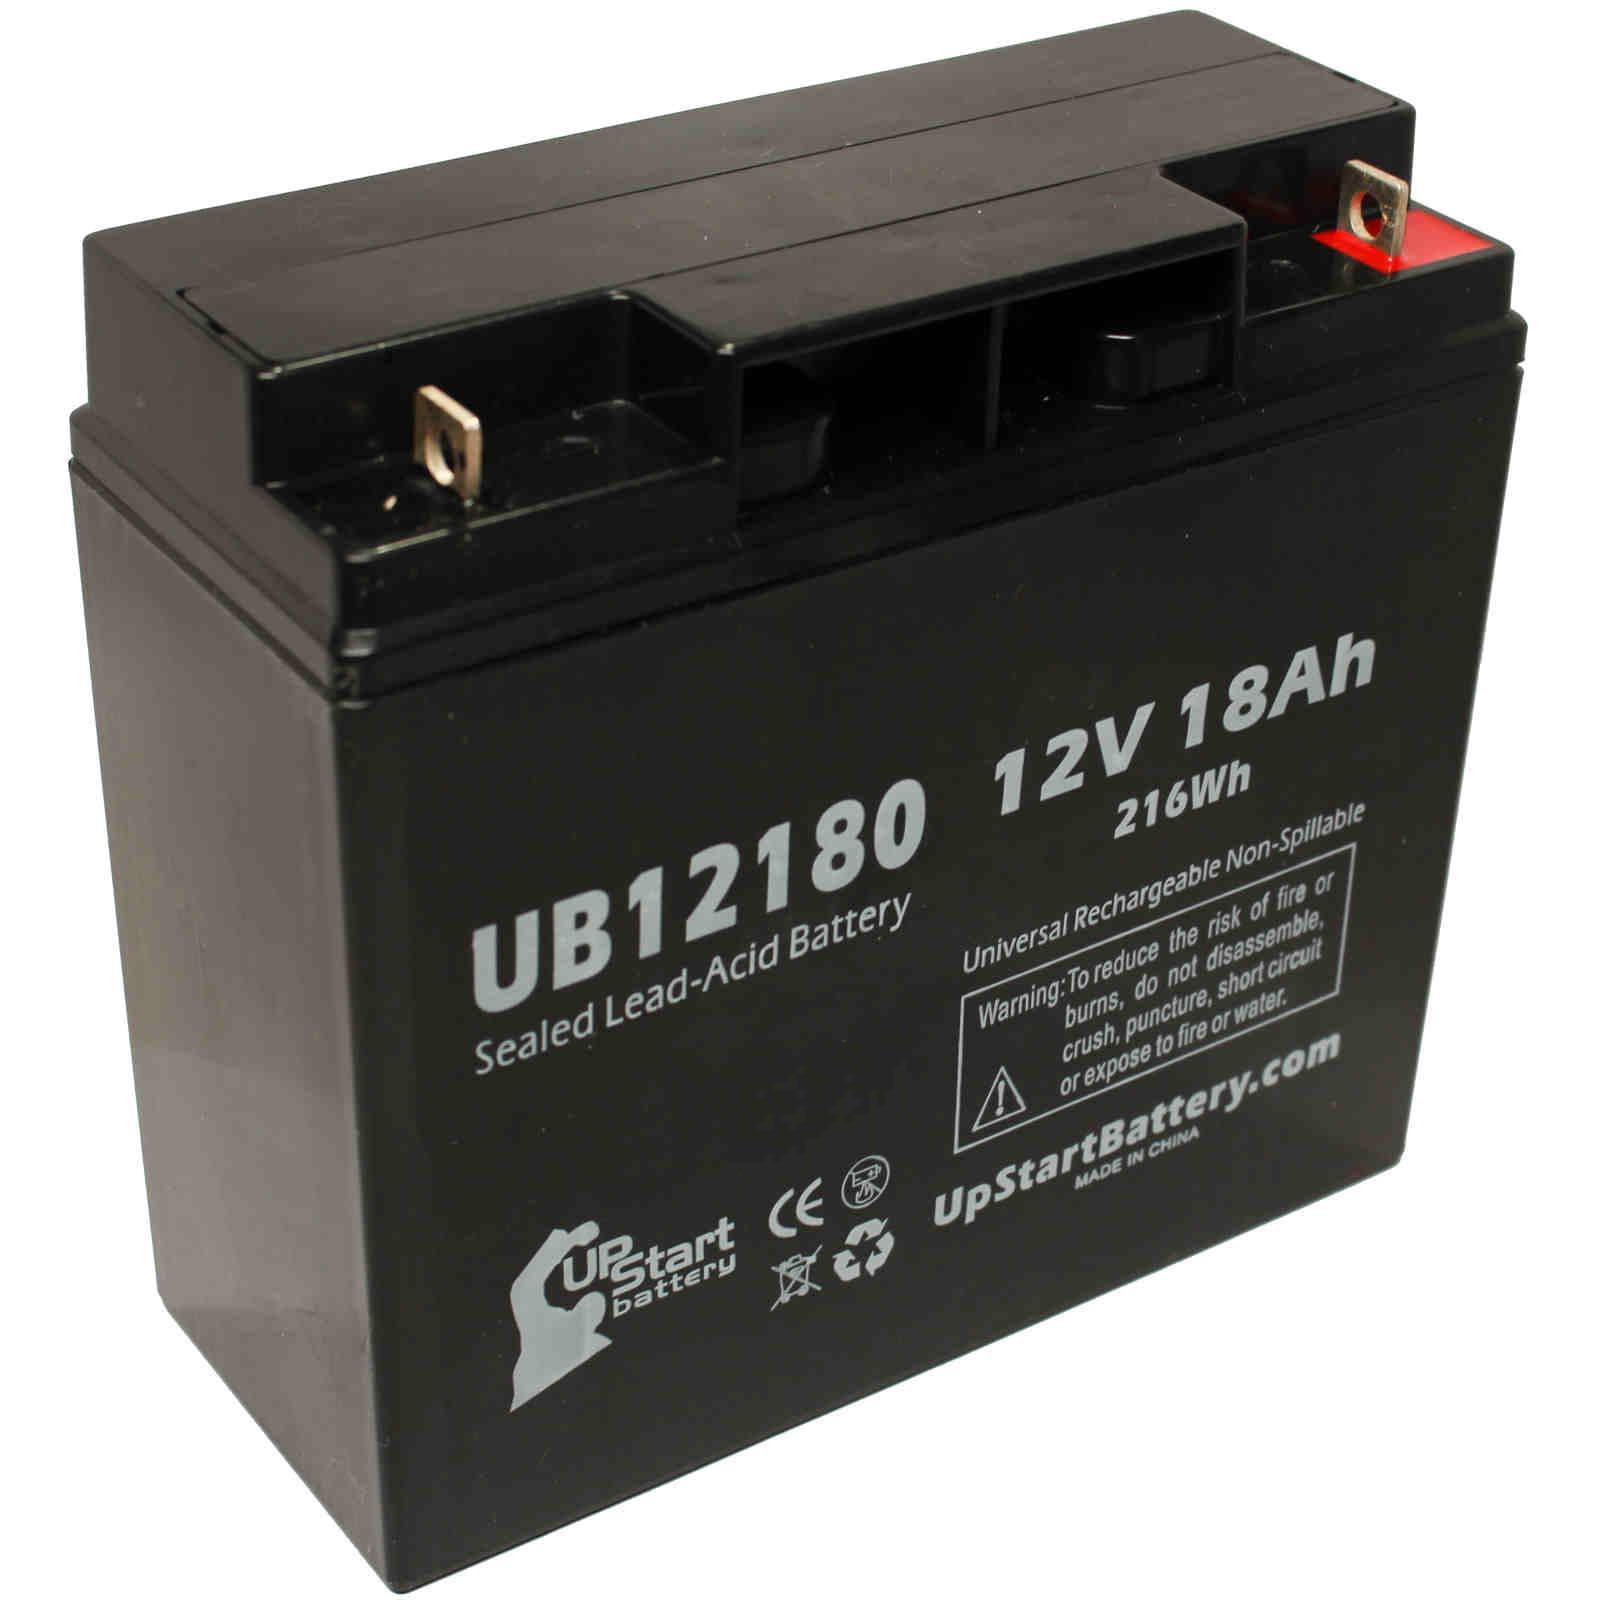 Amigo RT Battery Replacement - UB12180 Universal Sealed Lead Acid Battery (12V, 18Ah, 18000mAh, T4 Terminal, AGM, SLA) - image 4 of 4